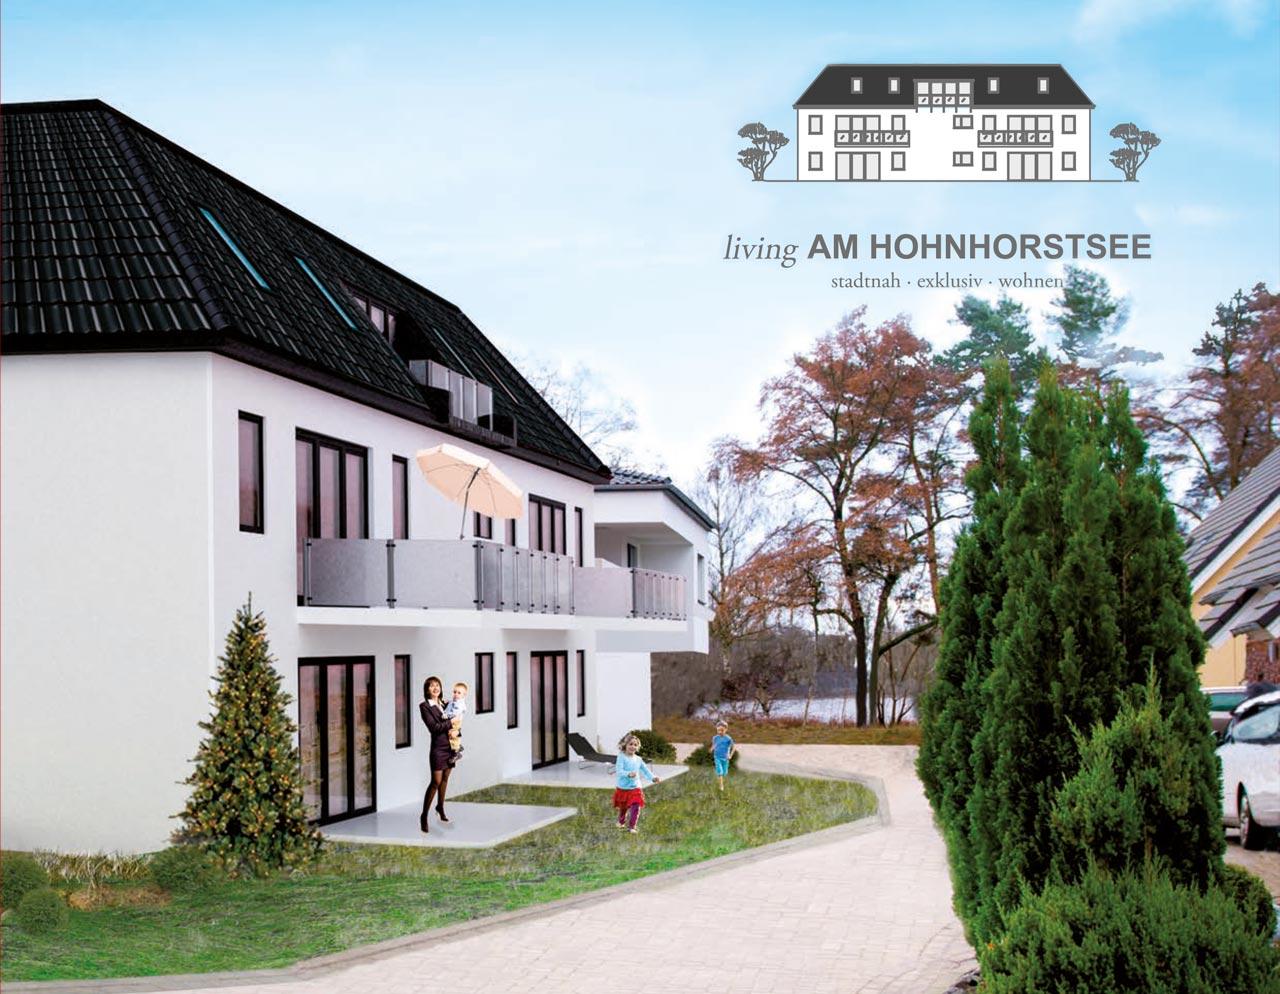 Living Lehrte Hohnhorstsee